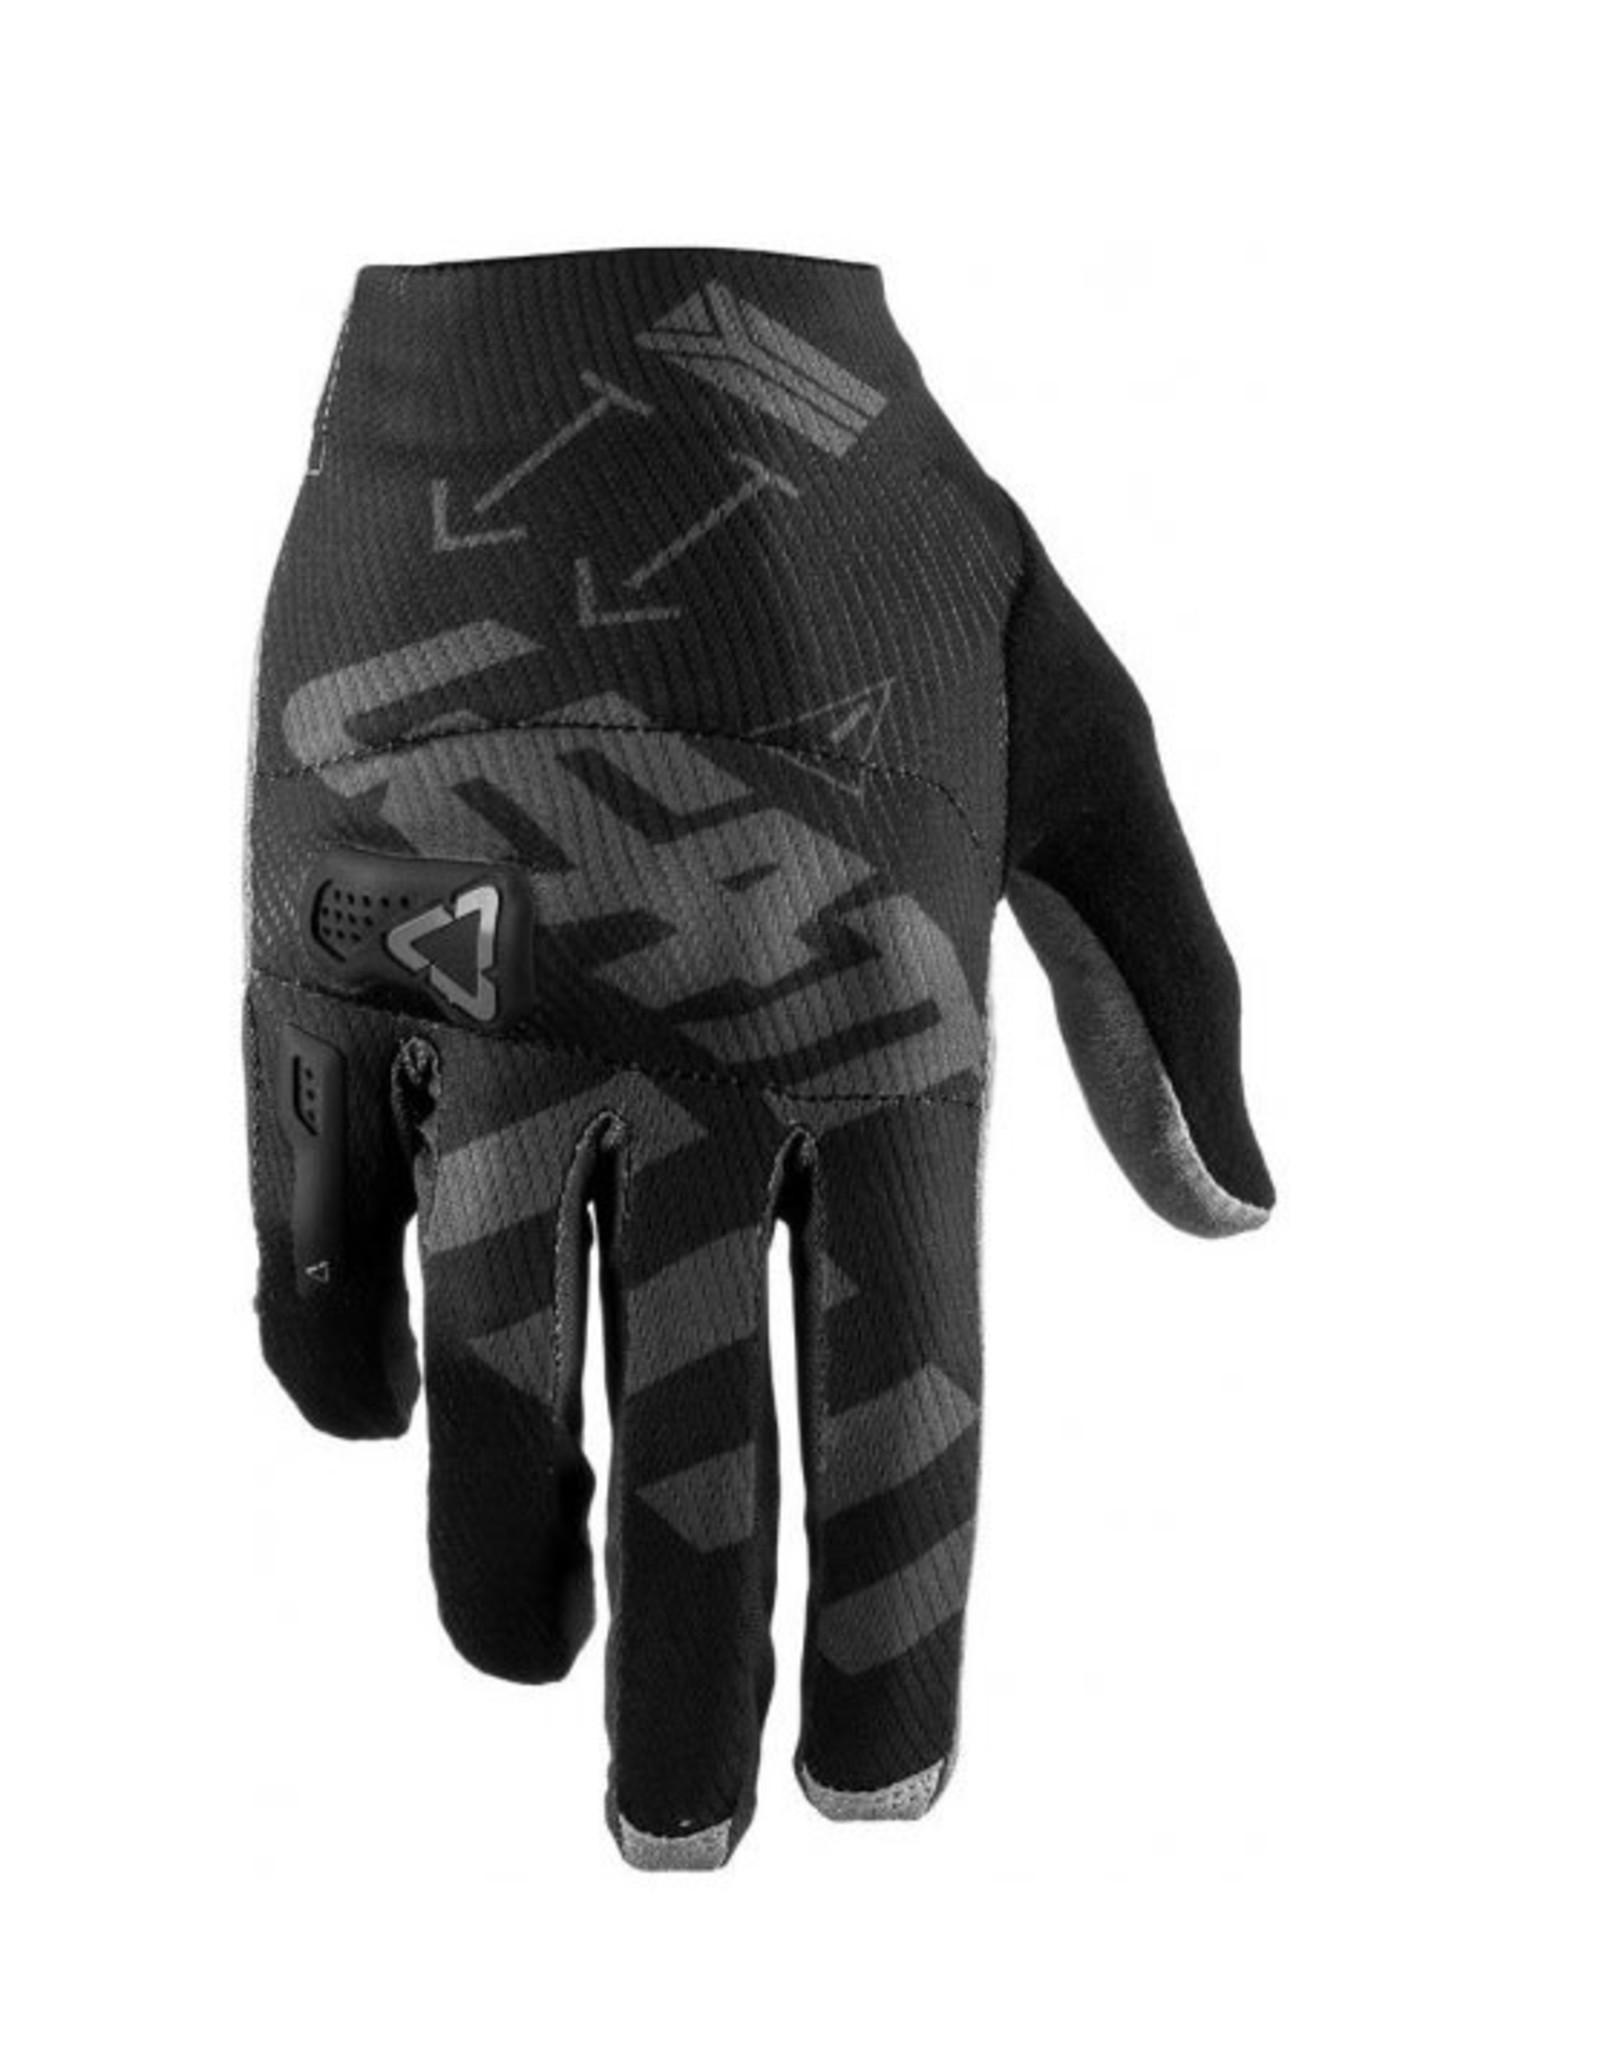 Leatt Gloves Leatt DBX 3.0